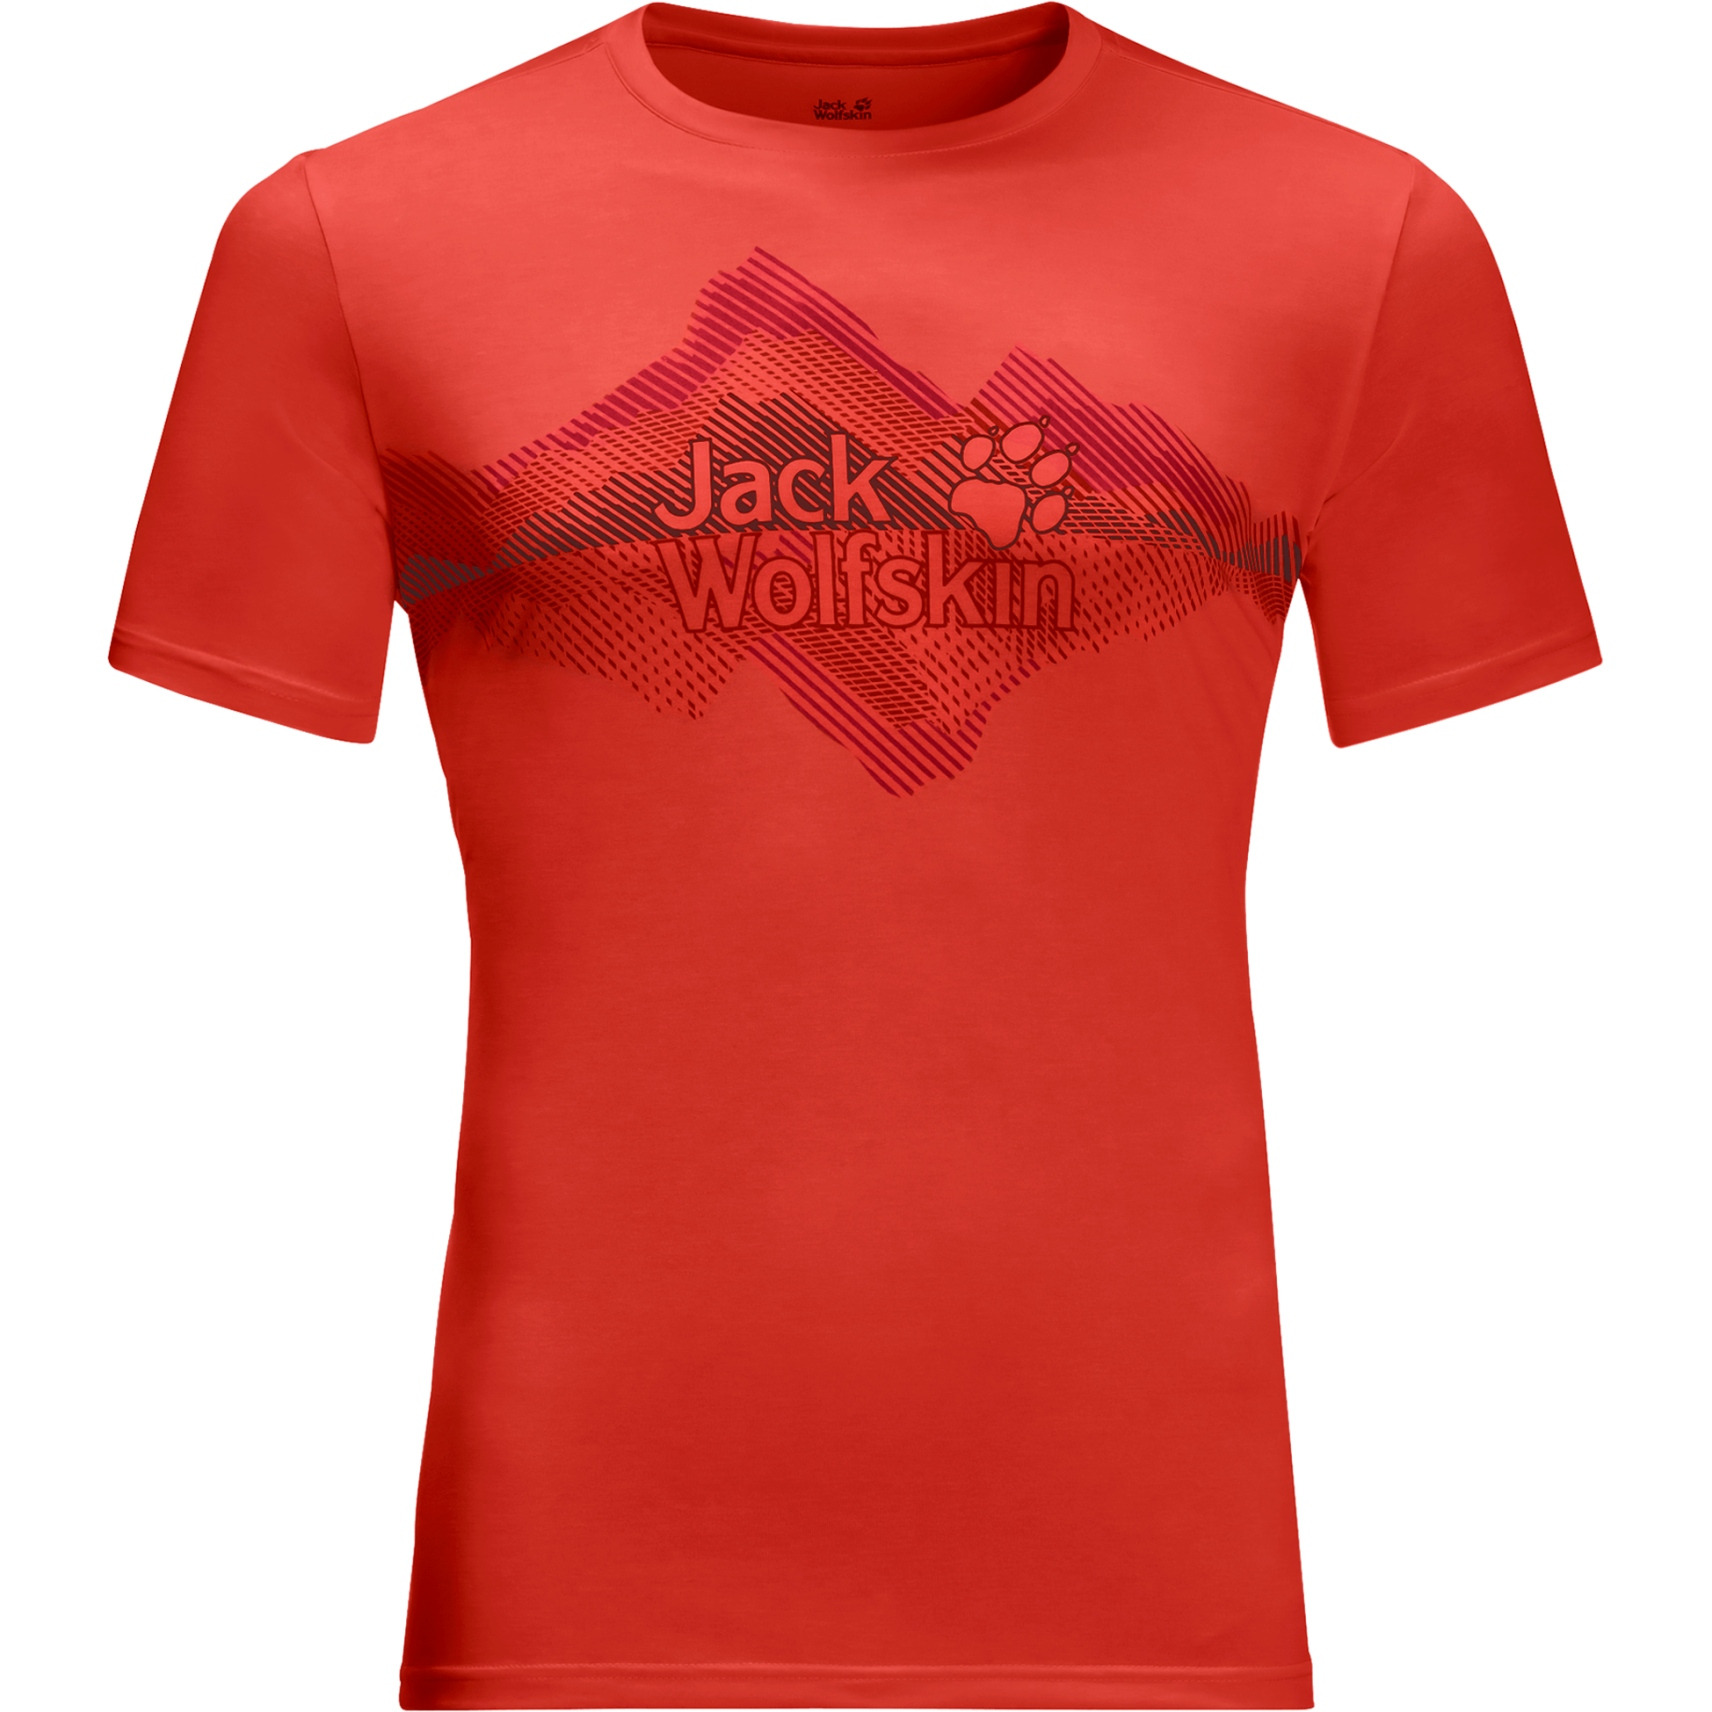 Jack Wolfskin Crosstrail Graphic T-Shirt - lava red